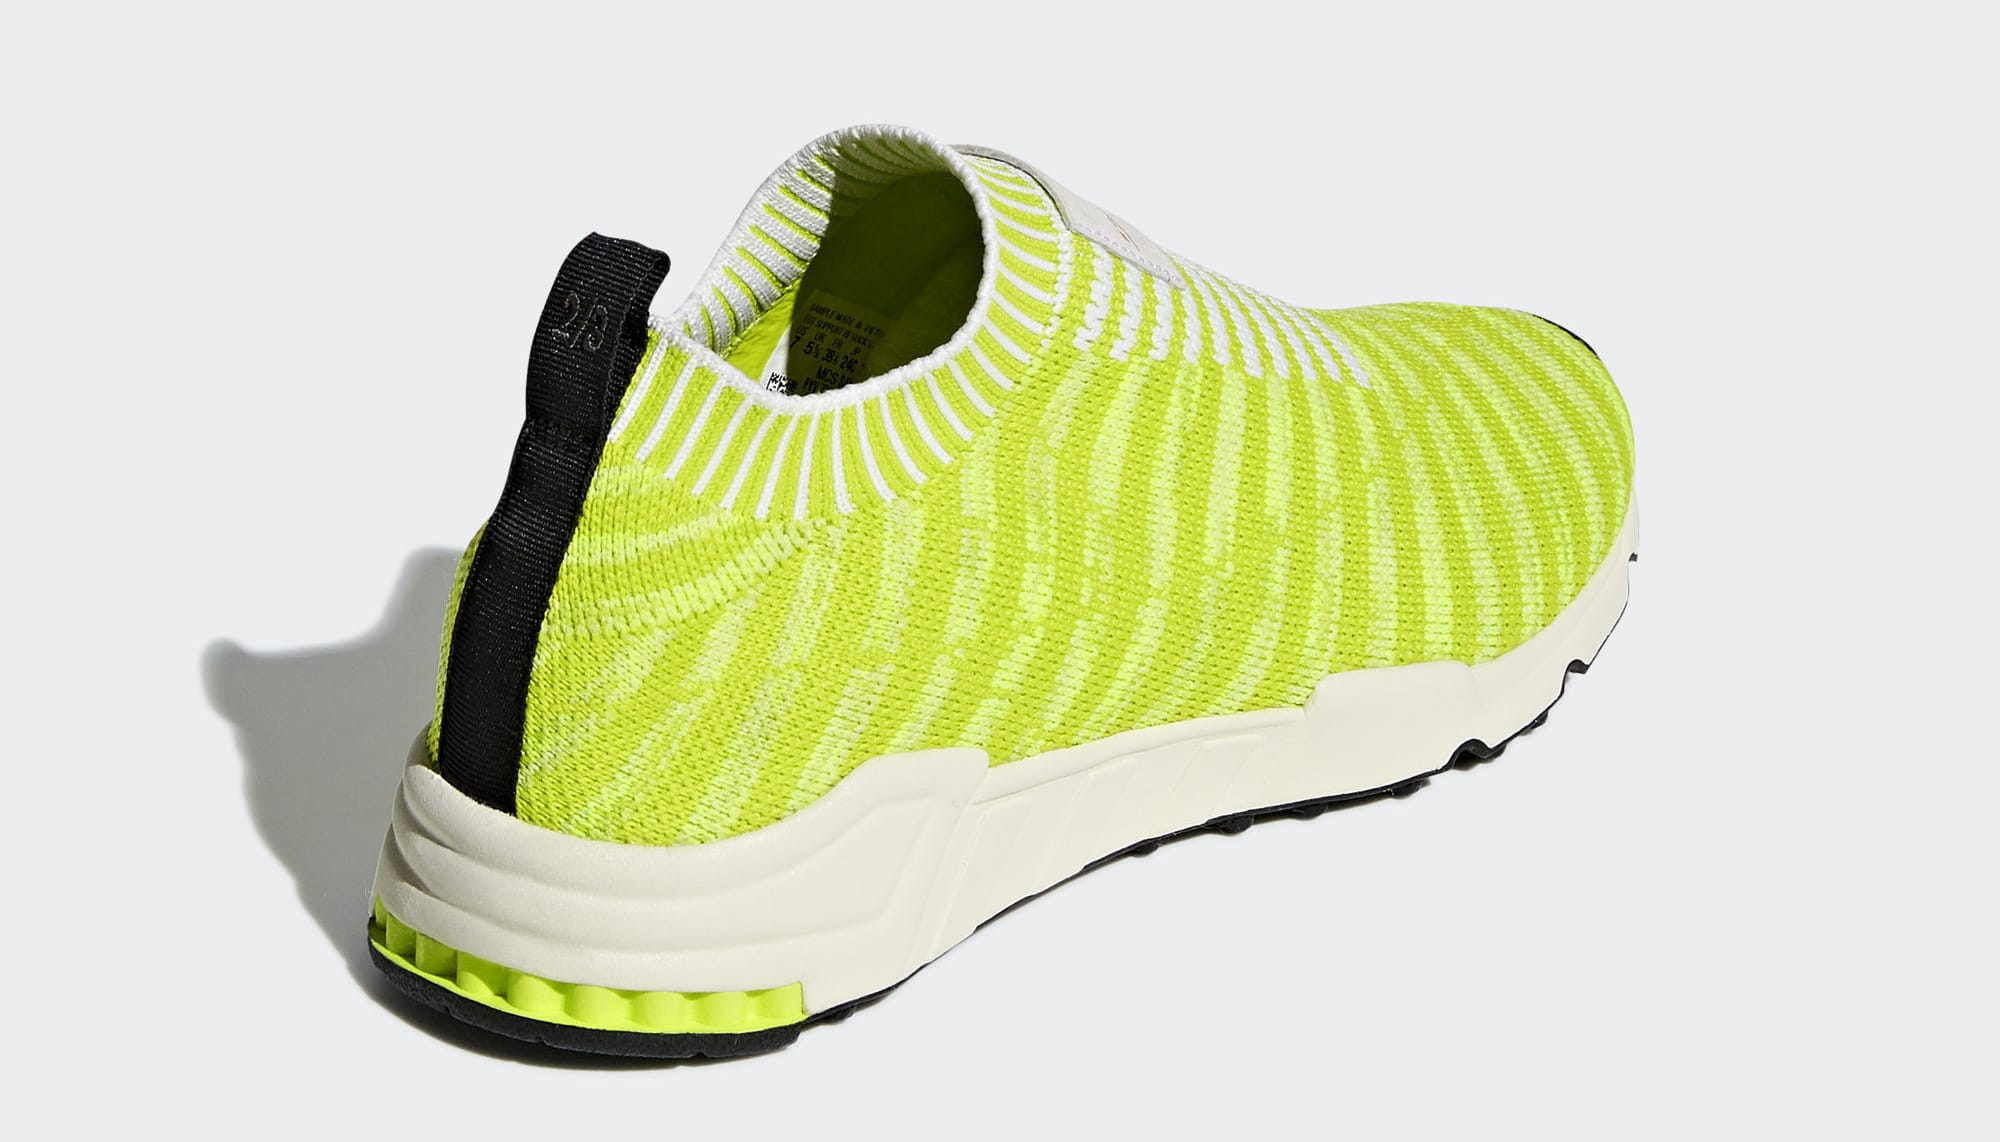 Adidas EQT Support Sock PK 'Solar Yellow' B37545 (Heel)